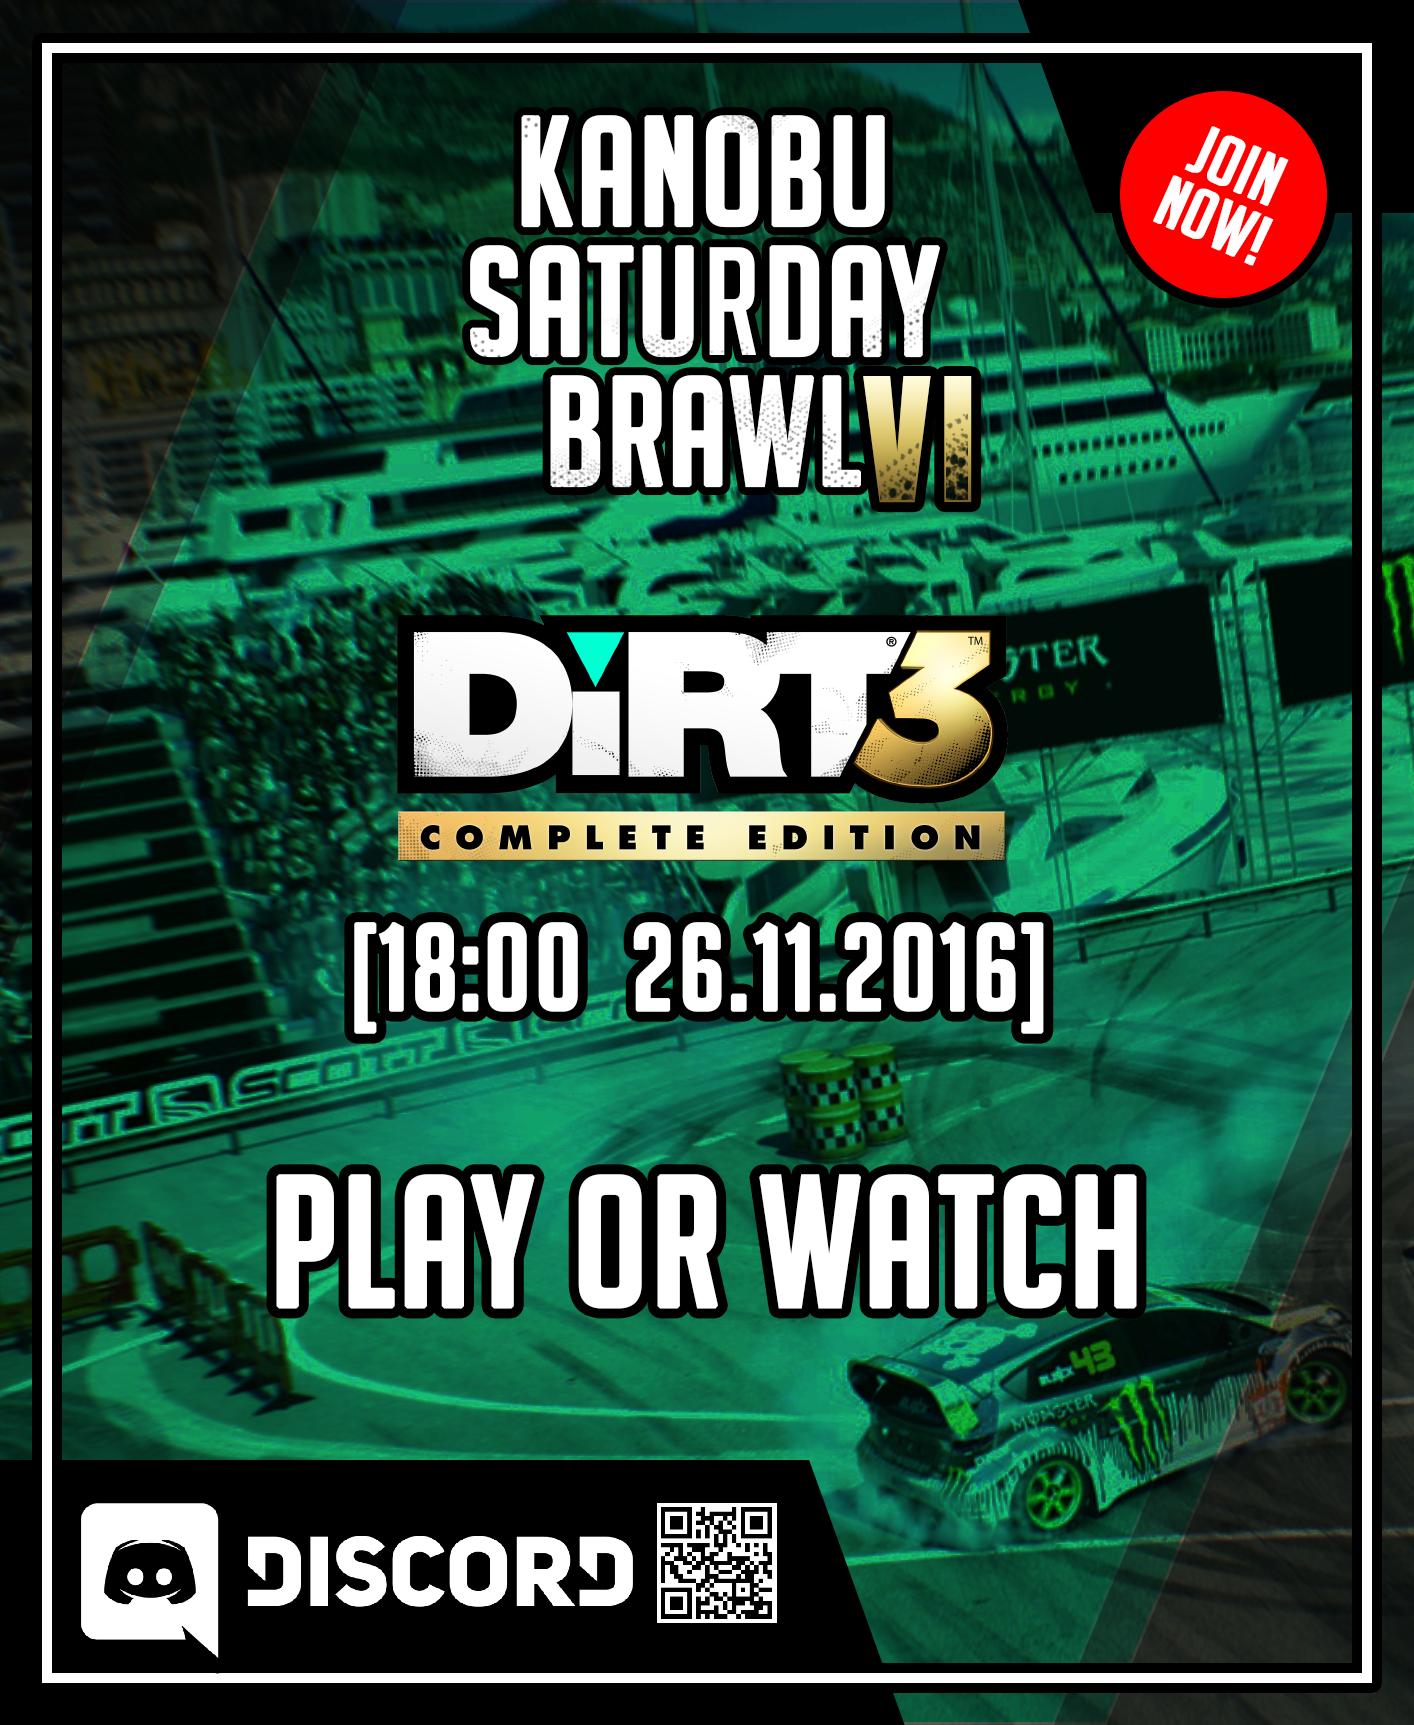 Kanobu saturday brawl 4: Dirt3 - Изображение 1